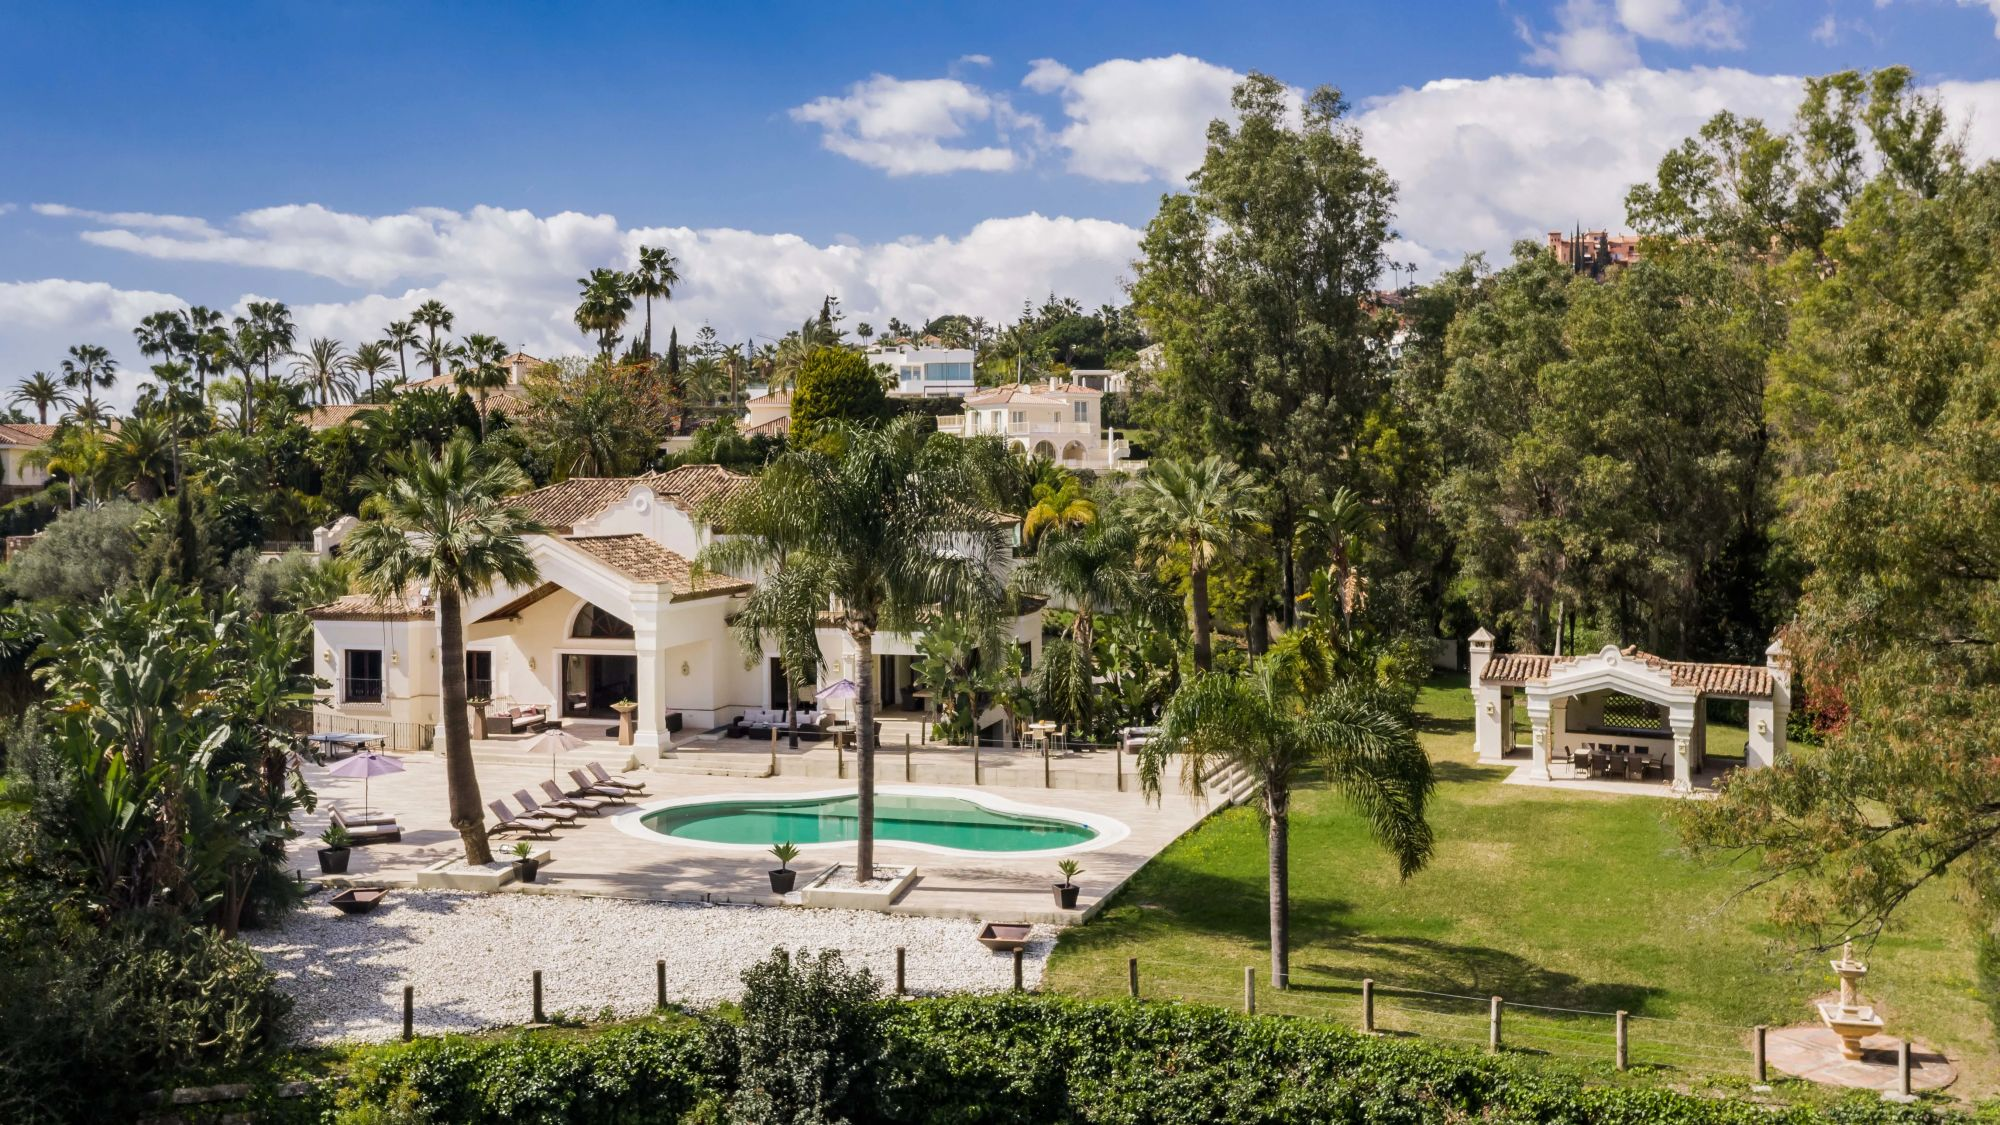 Nueva Andalucia, Marbella, Spain </br>(Auction 13 May)